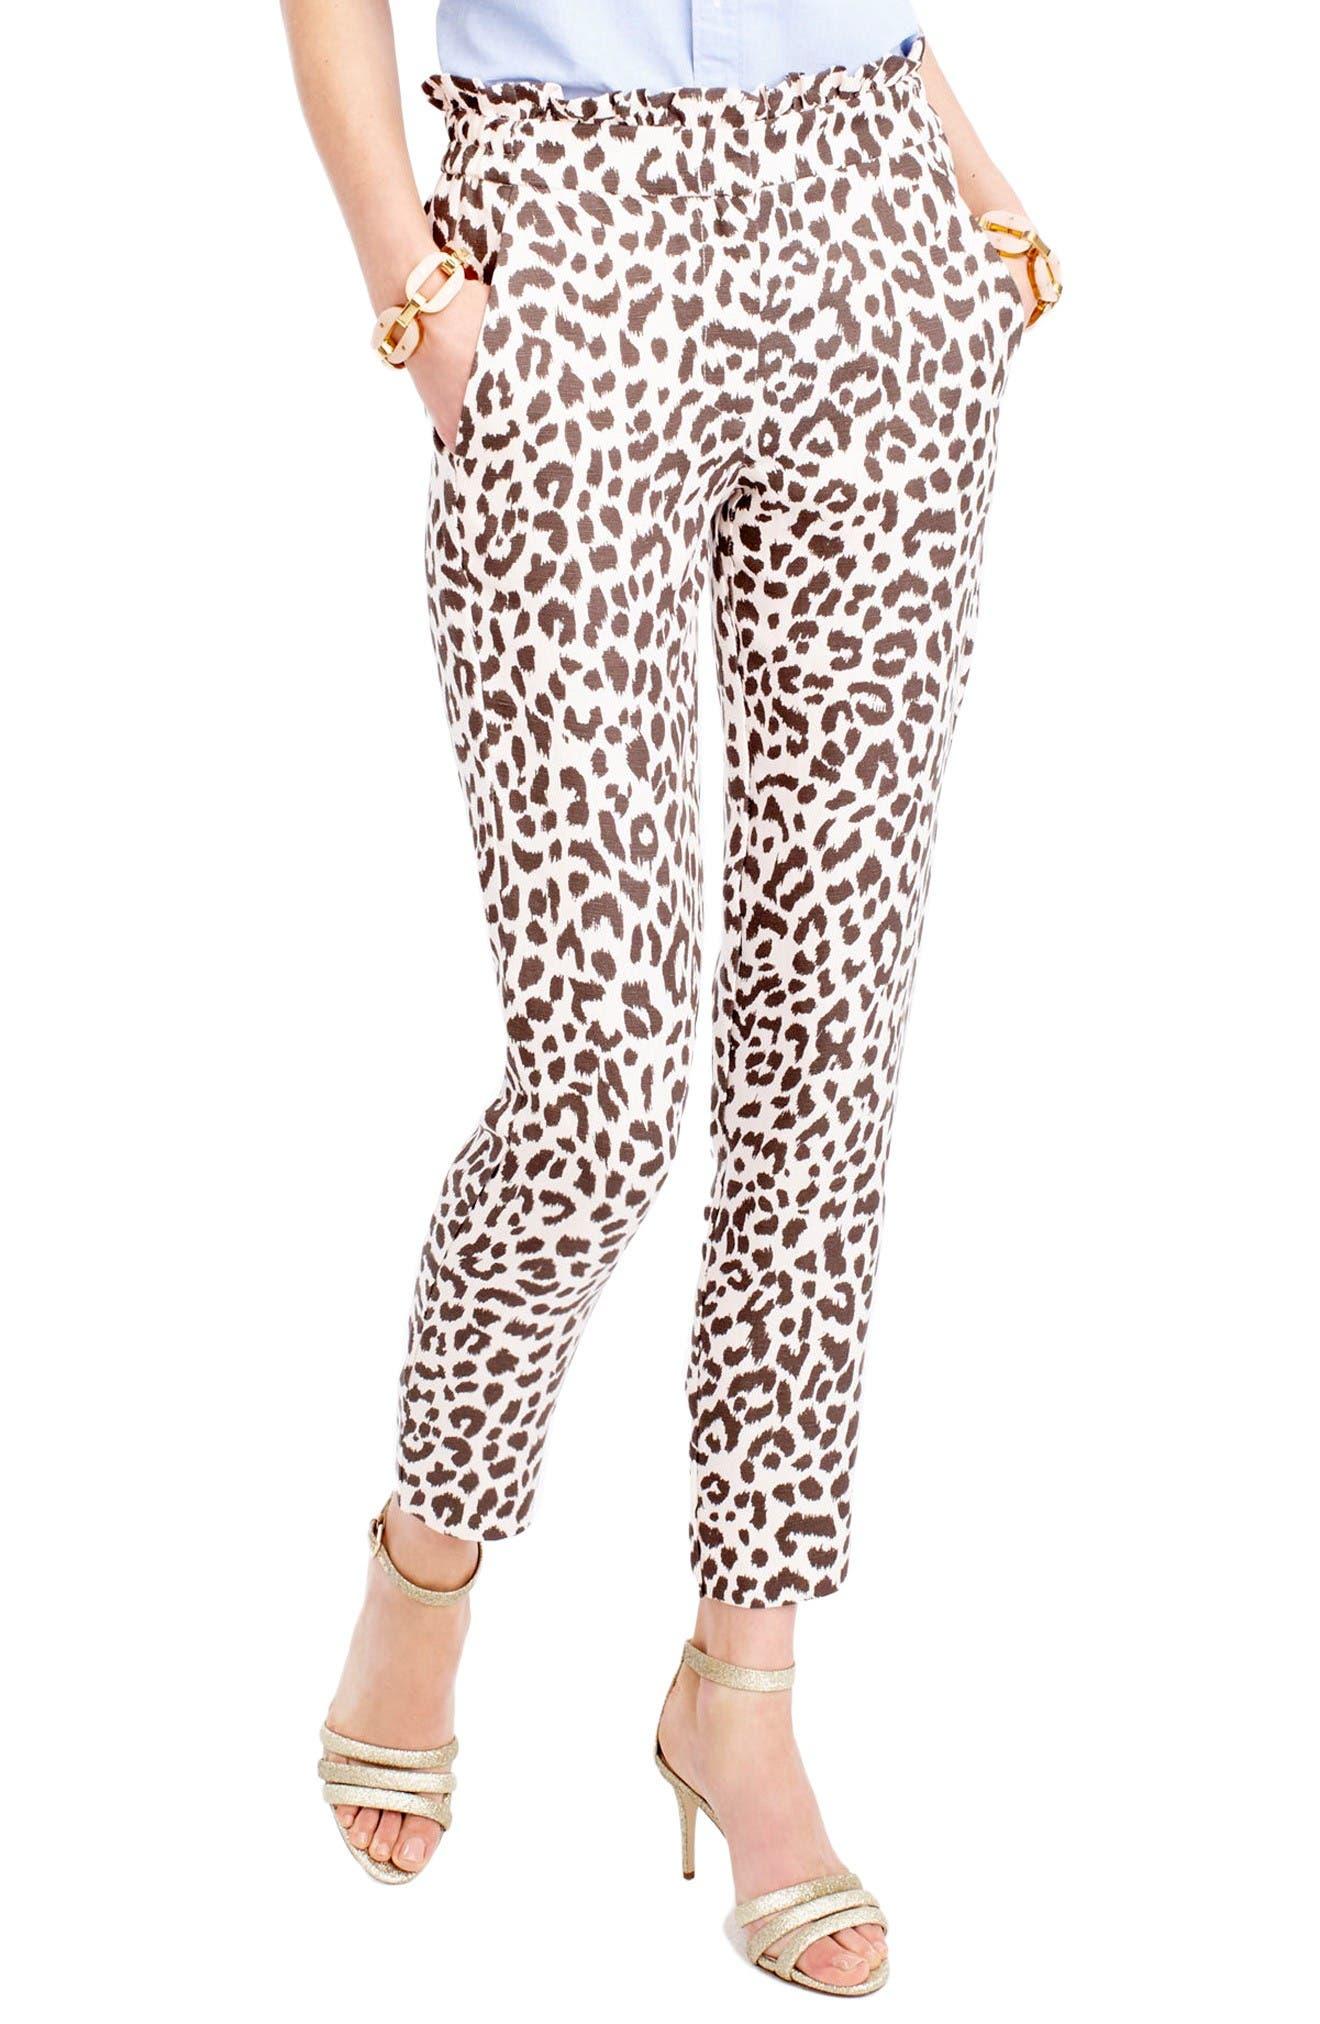 Alternate Image 1 Selected - J.Crew Ruffle Waist Leopard Print Linen Pants (Regular & Petite)